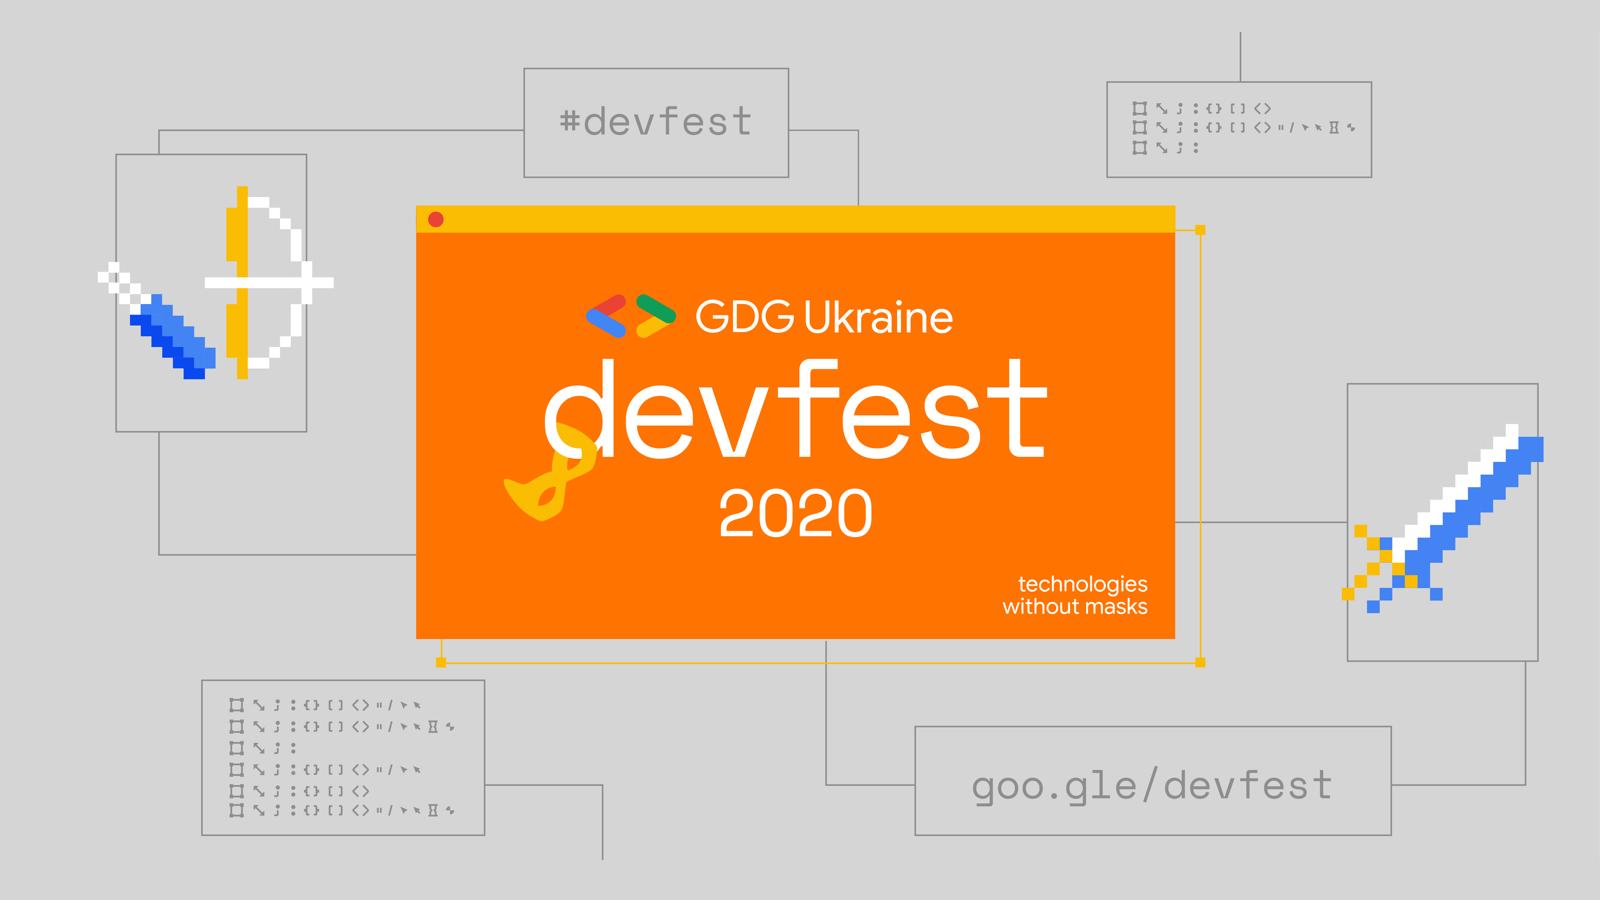 DevFest Ukraine 2020